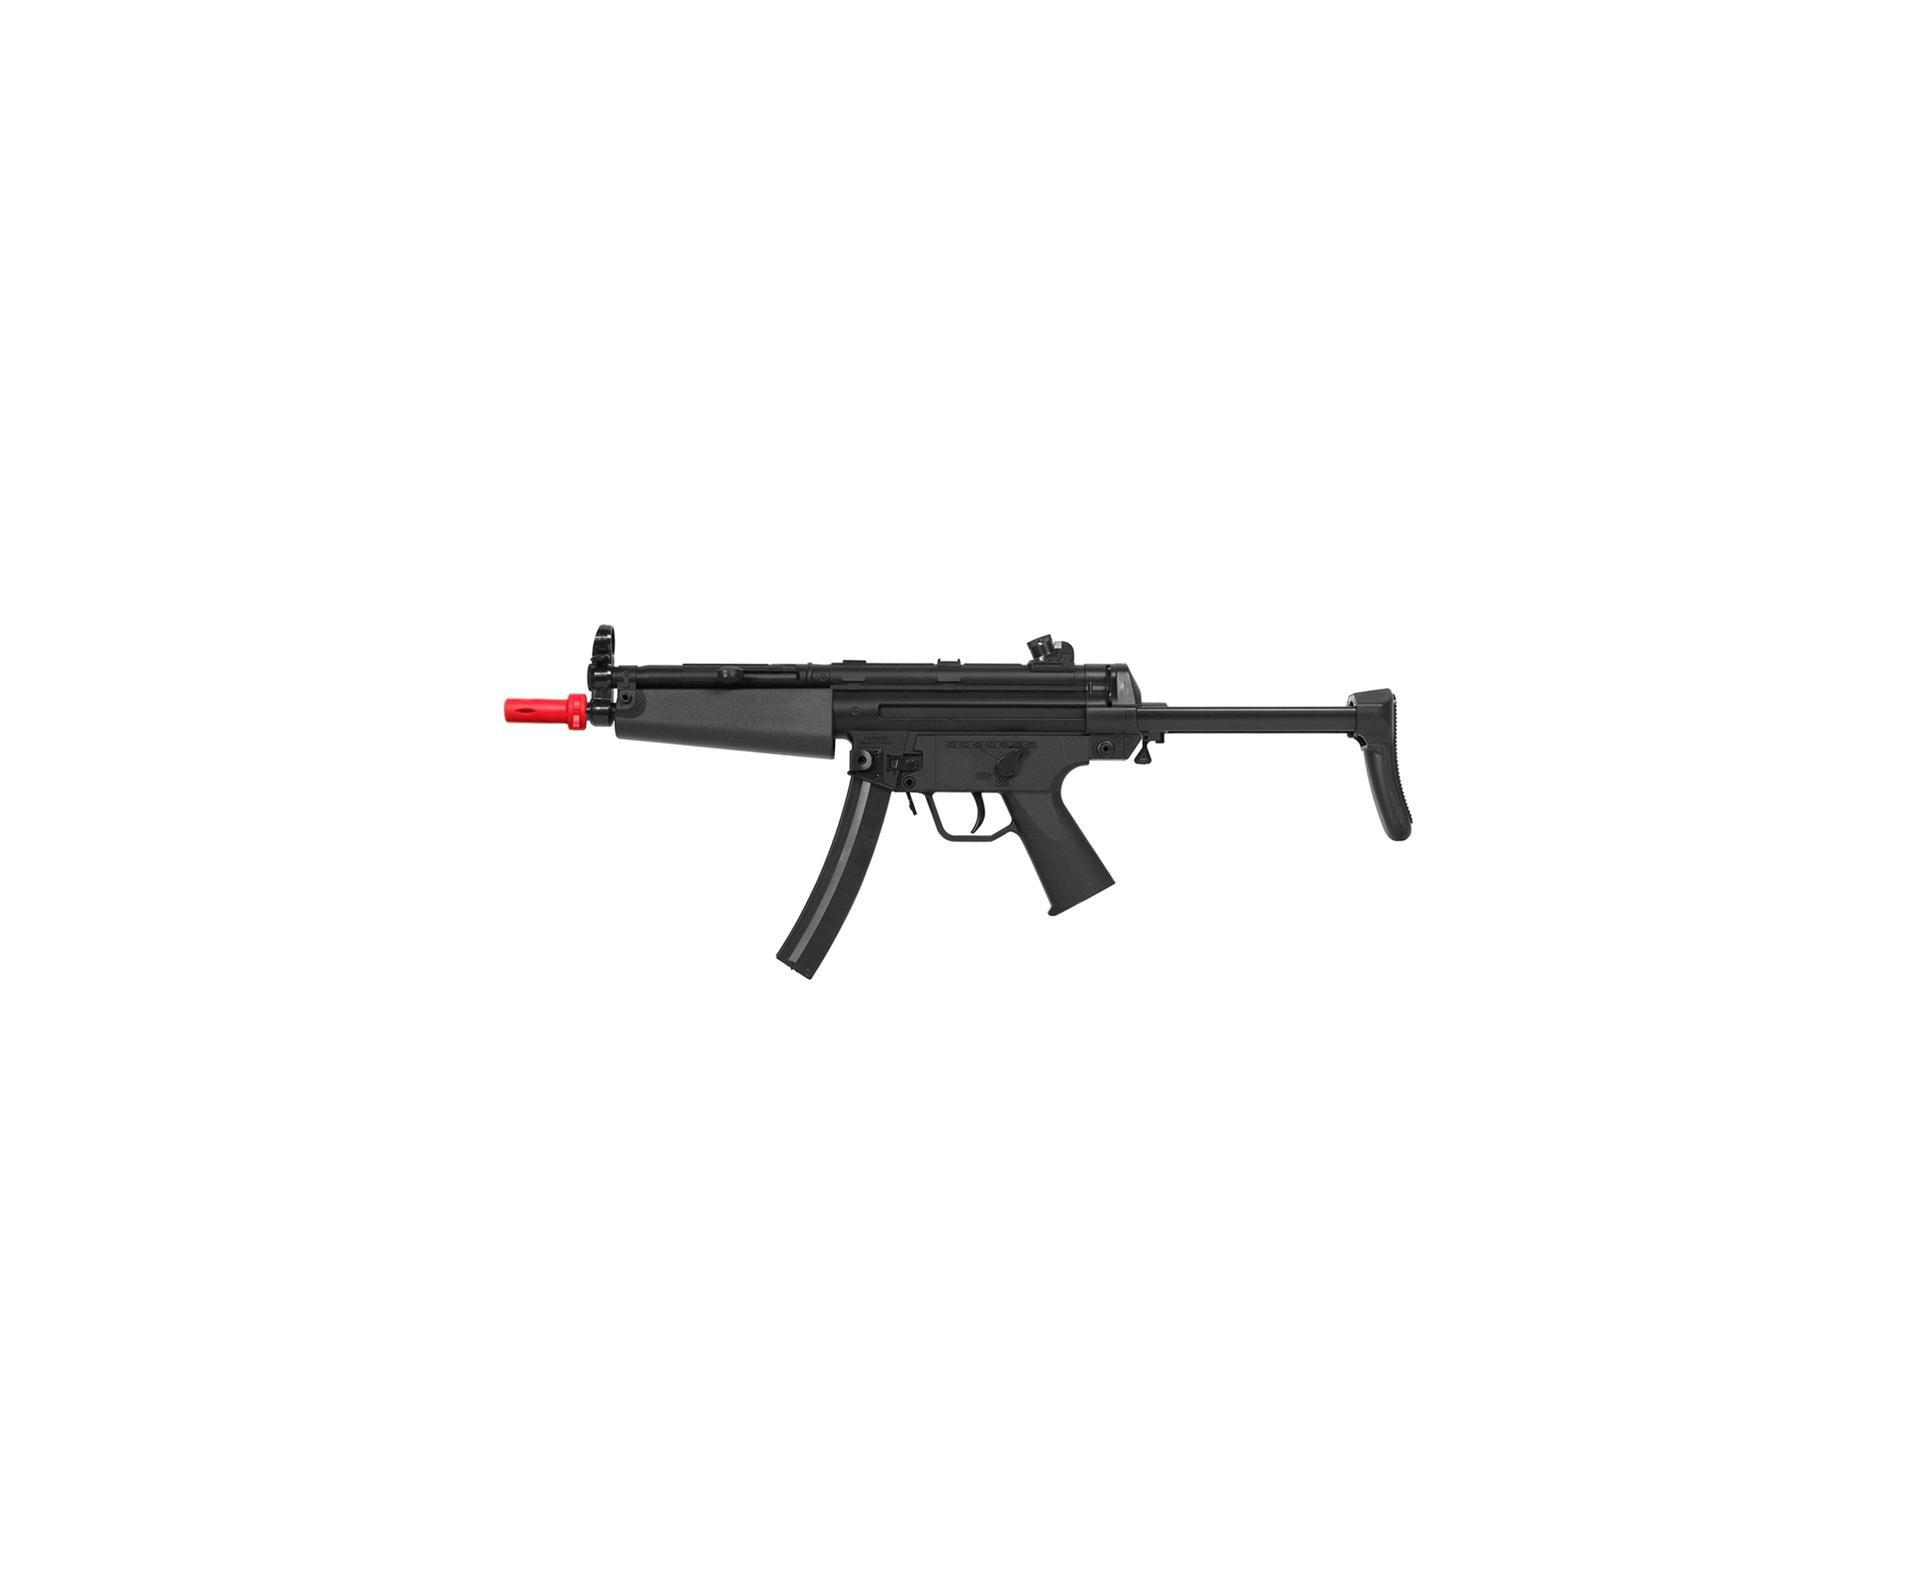 Rifle De Airsoft Mp5 A5 Semi/metal Cal 6mm - Umarex